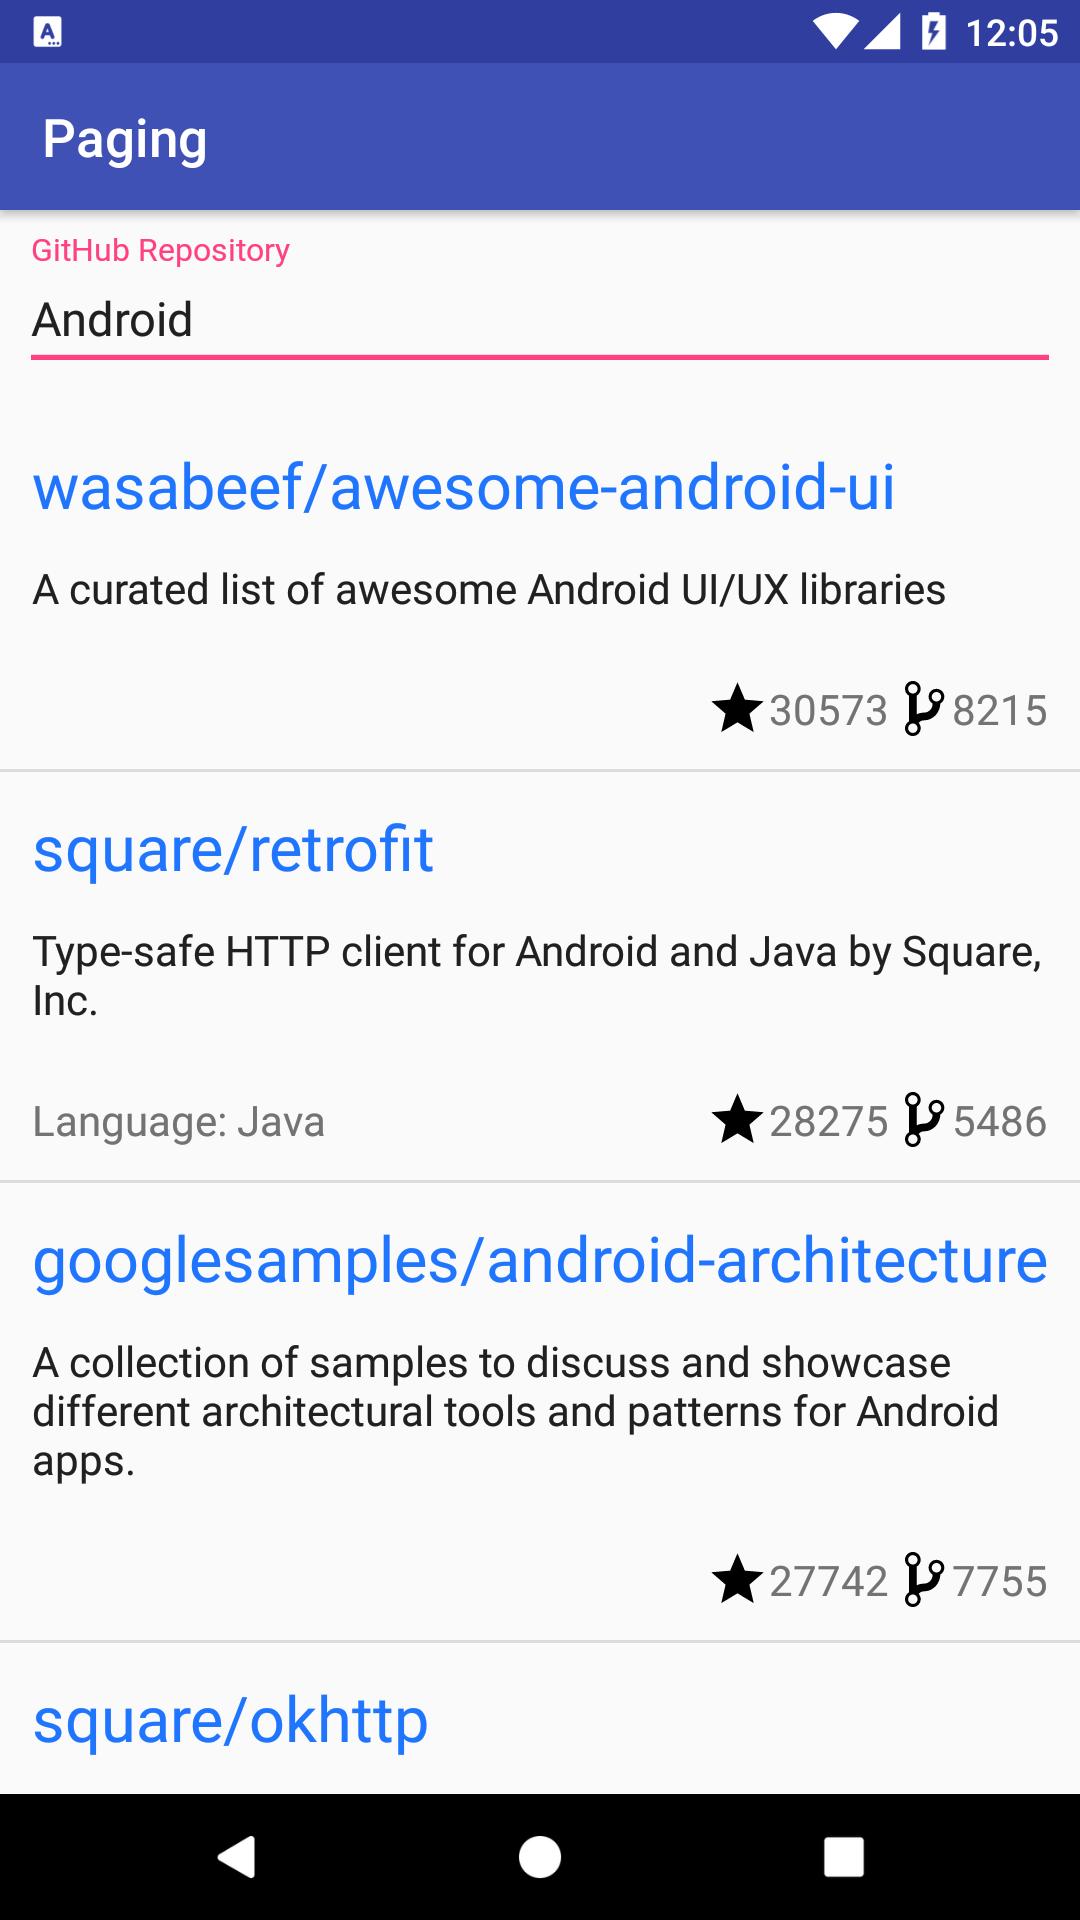 GitHub - kaushiknsanji/PagingSampleCodelab: Android App done as part